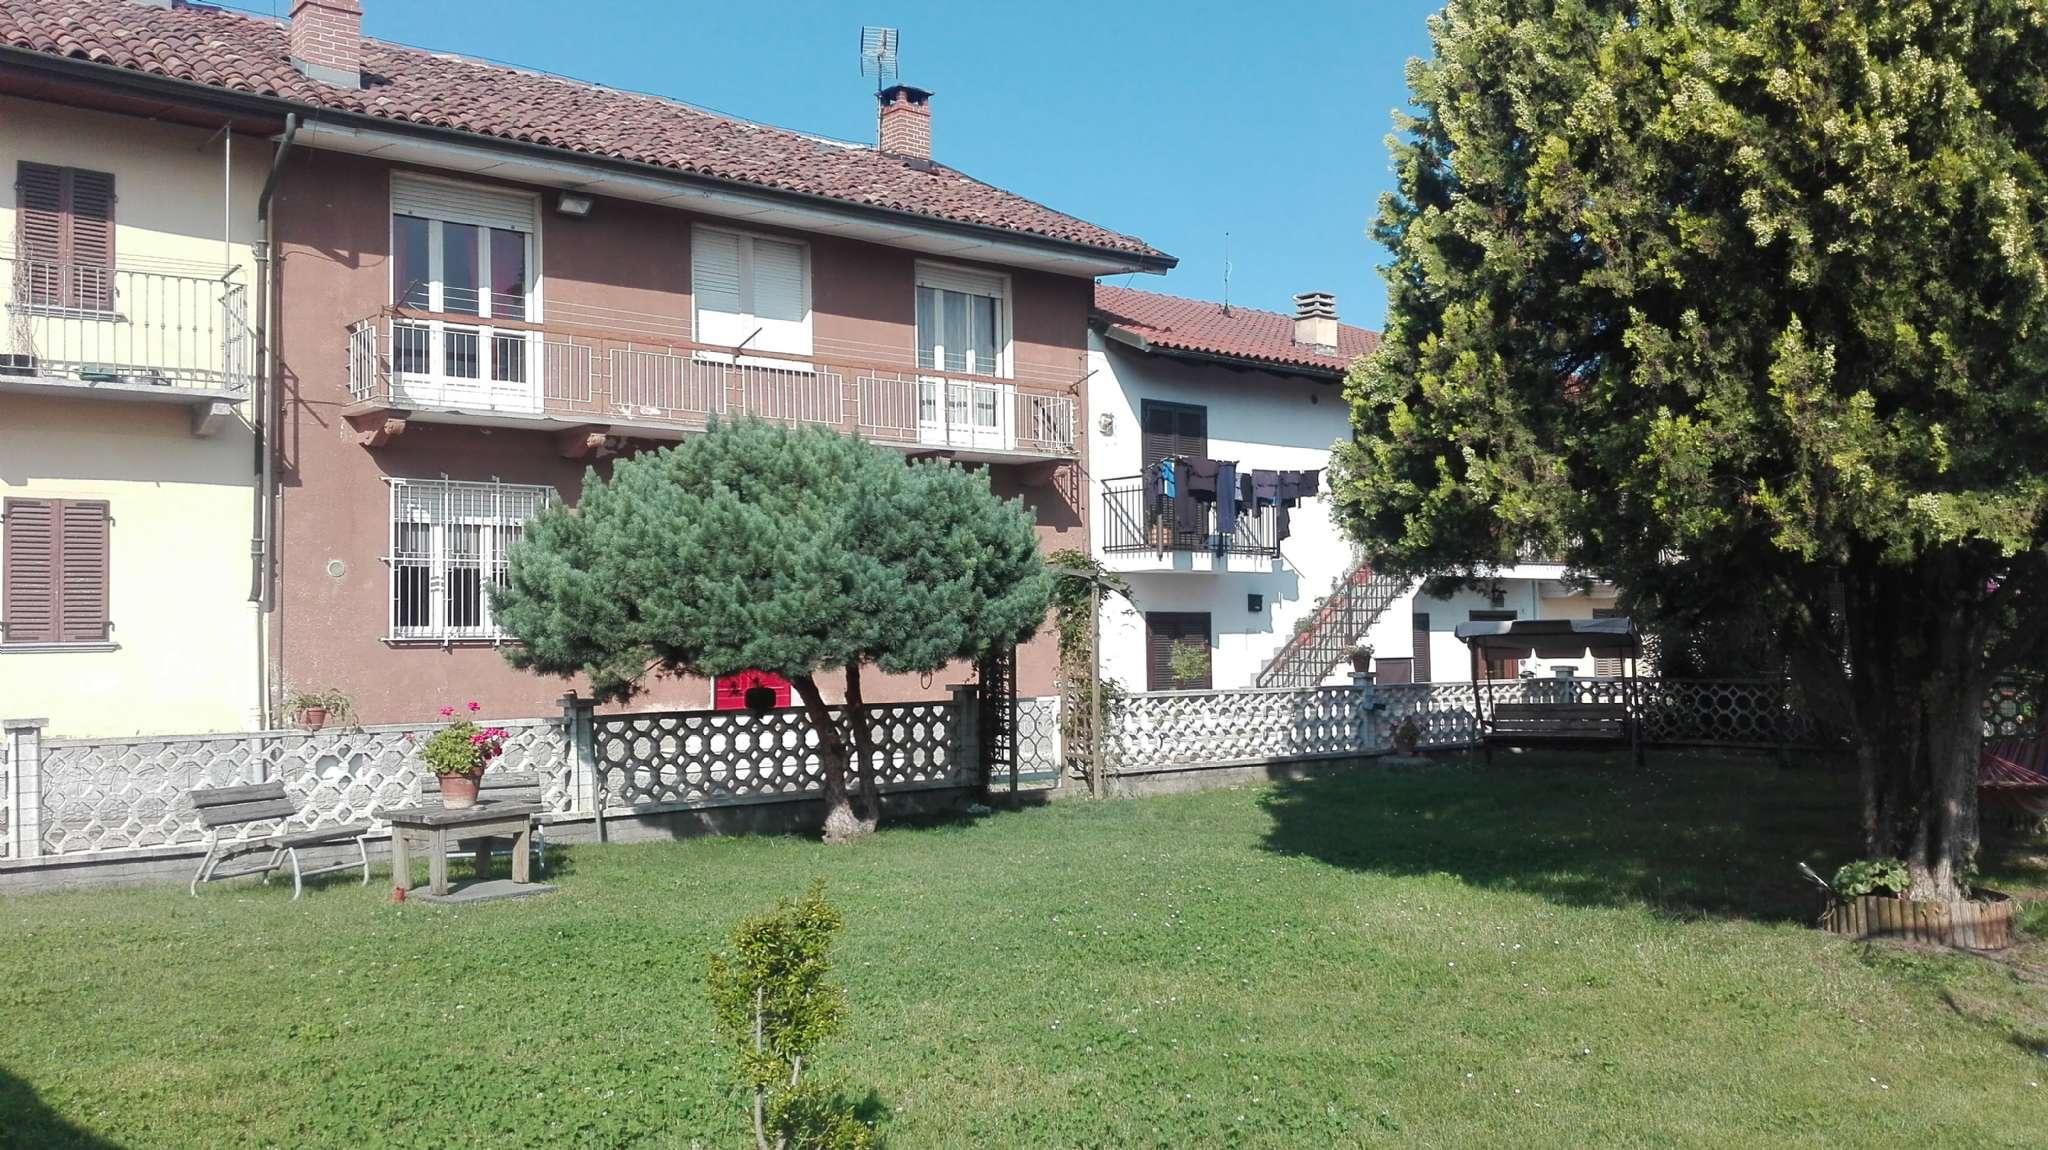 Foto 1 di Appartamento via Roma, Montaldo Torinese